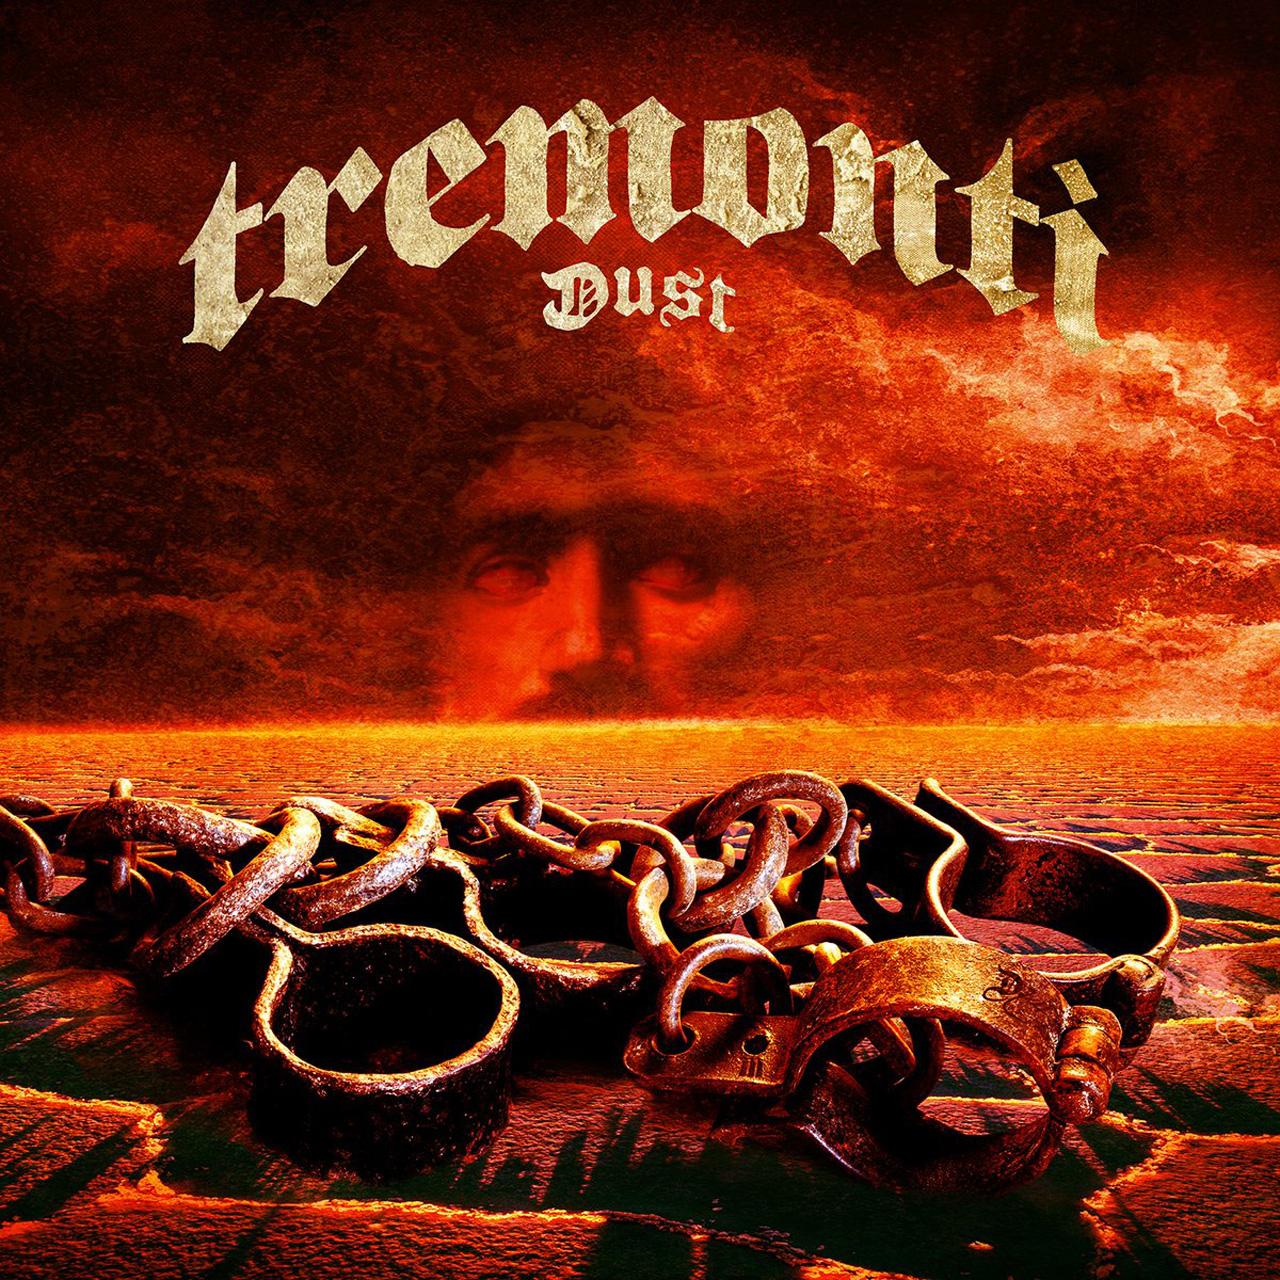 tremonti_dust.jpg